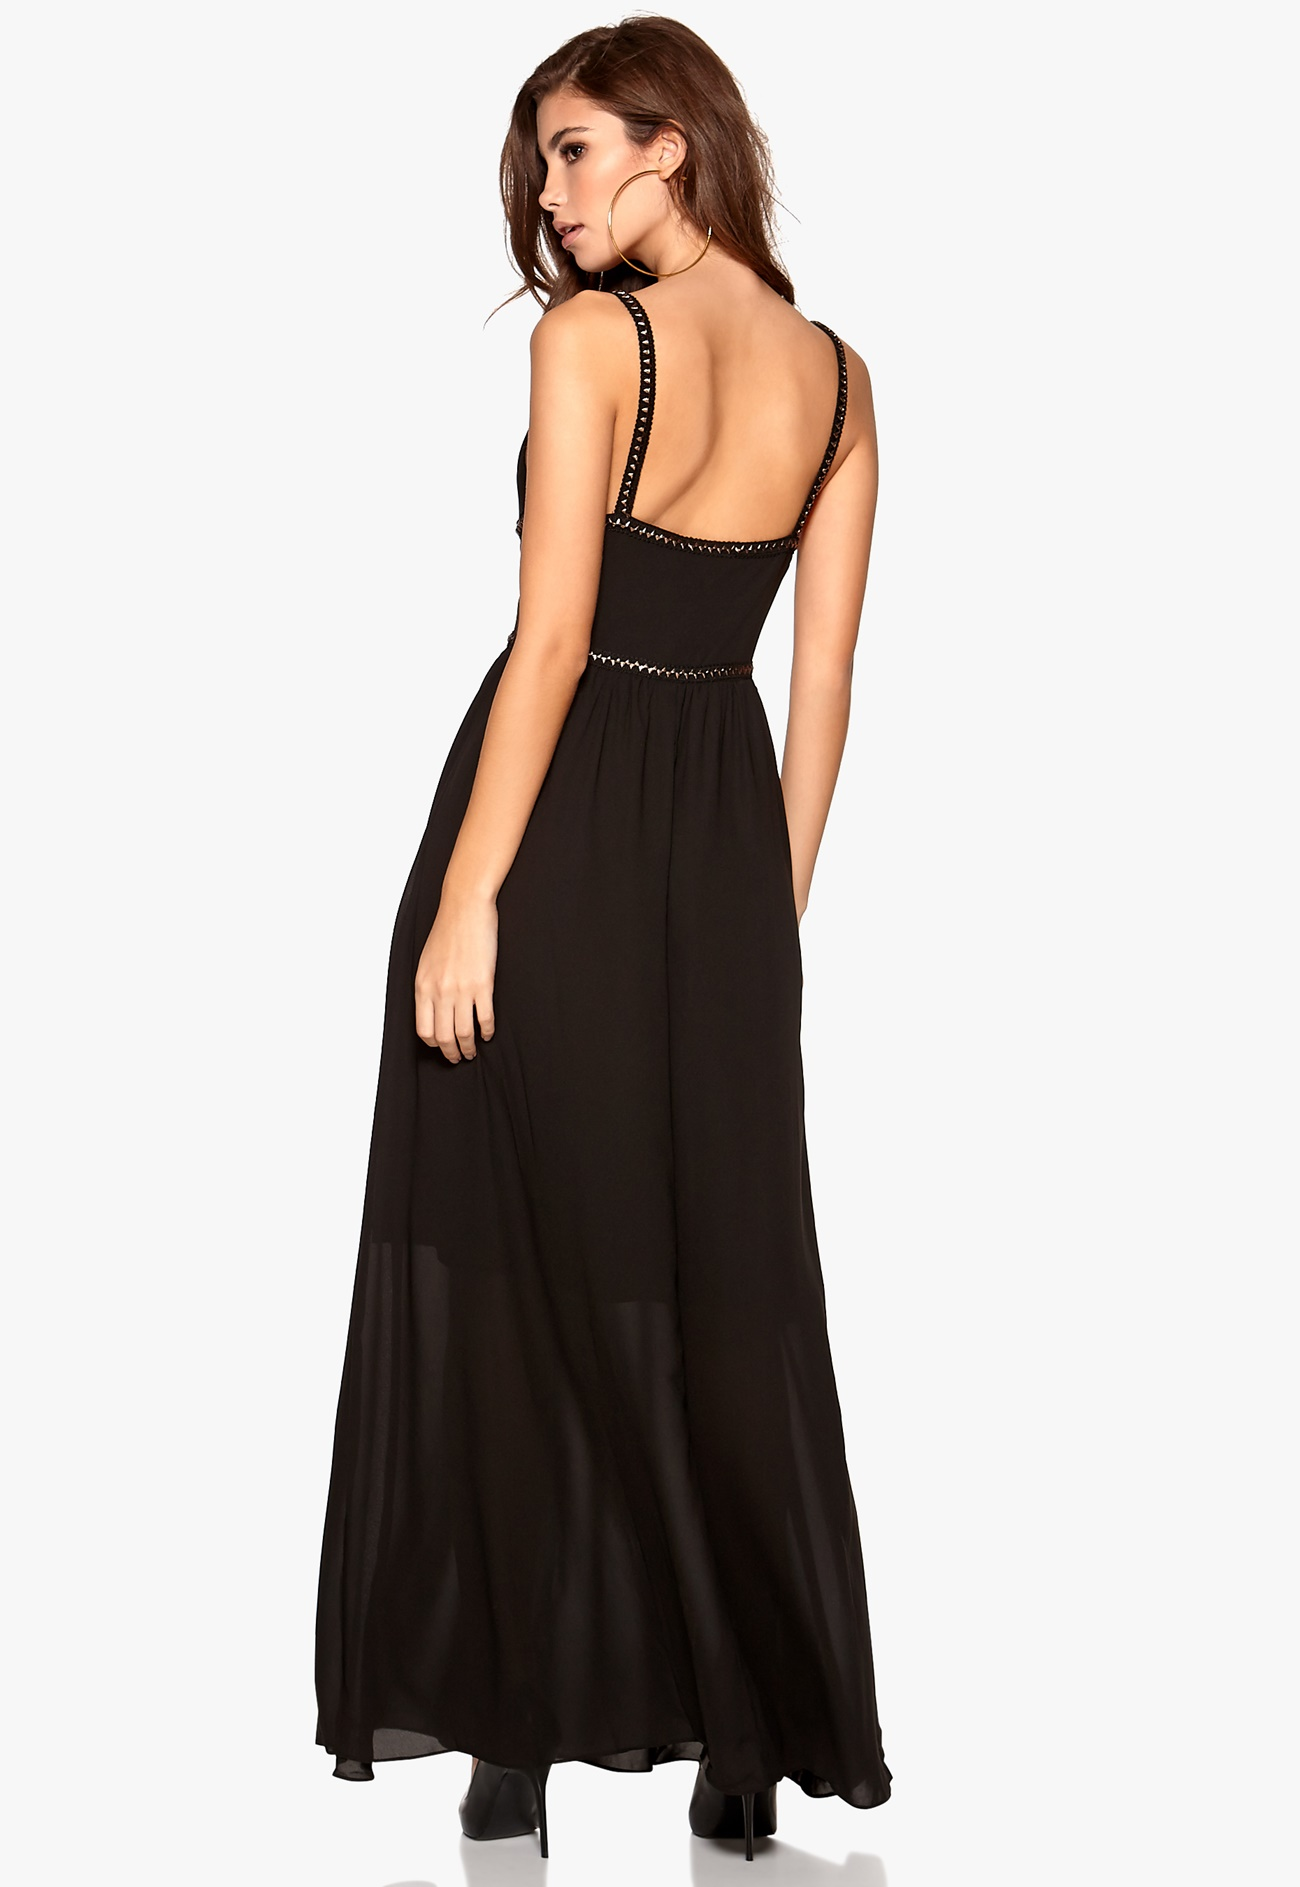 WYLDR Goddess Dress Black - Bubbleroom